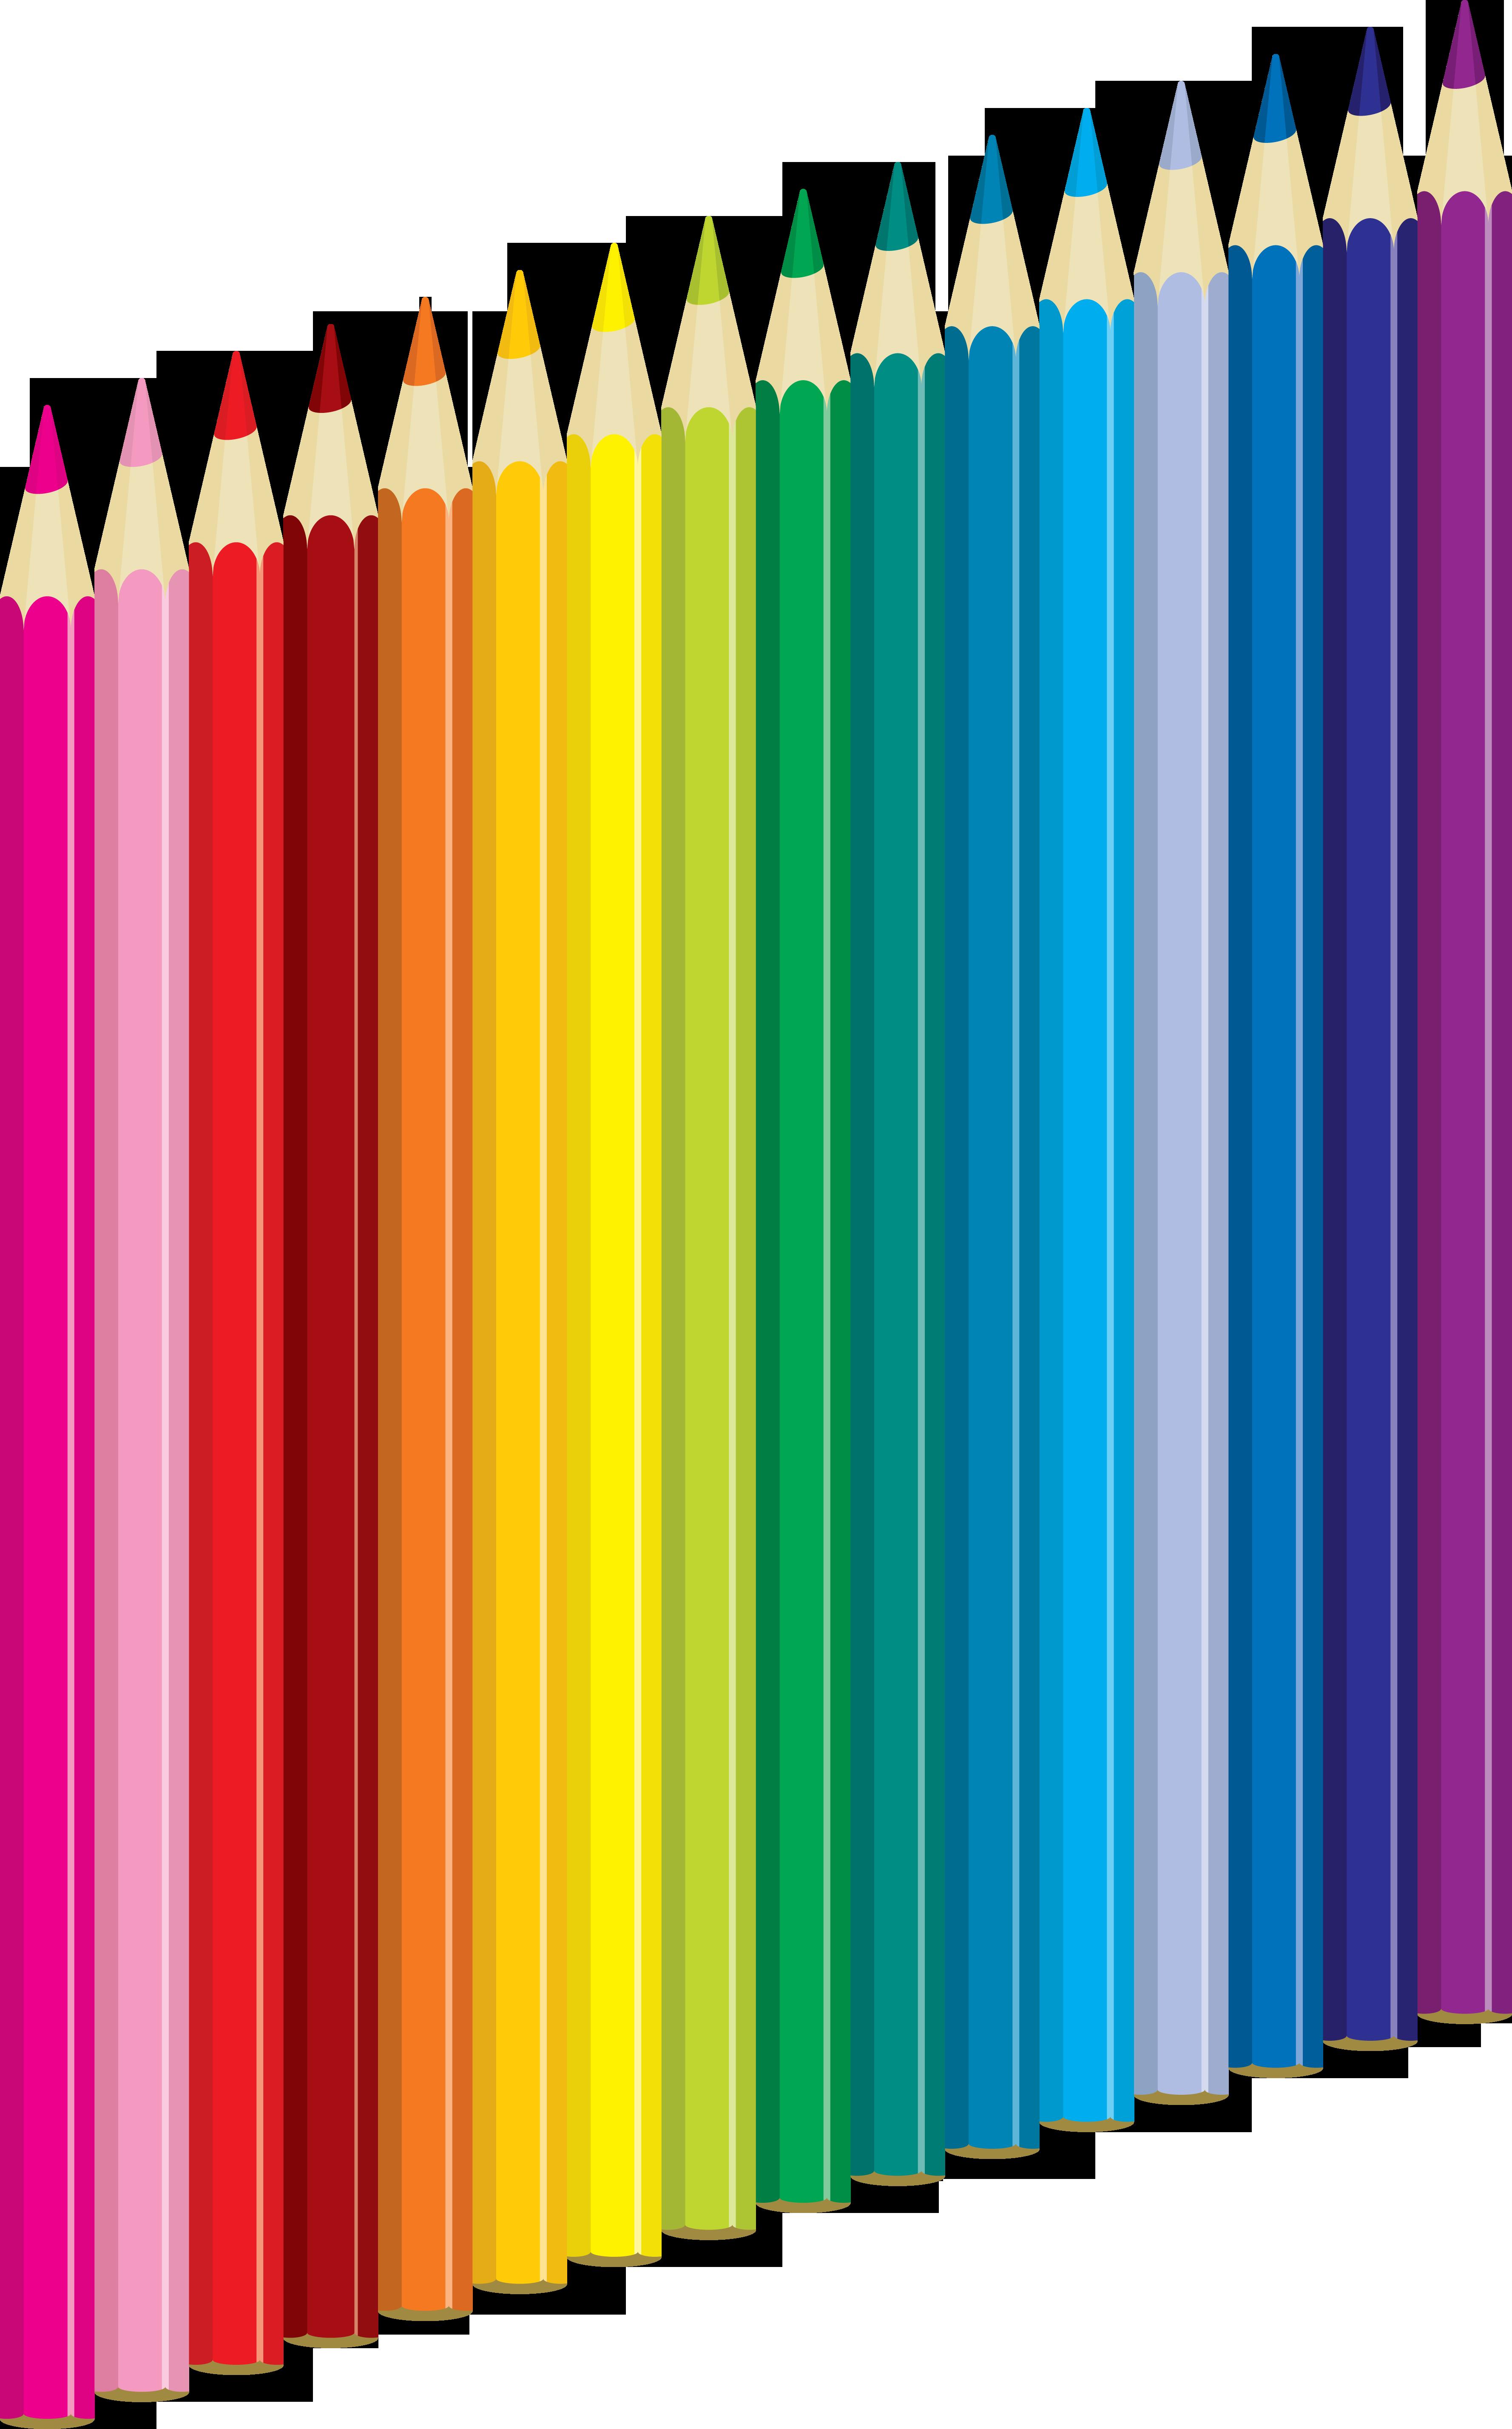 Color Pencil S Png Image Colored Pencils Pencil Pencil Png